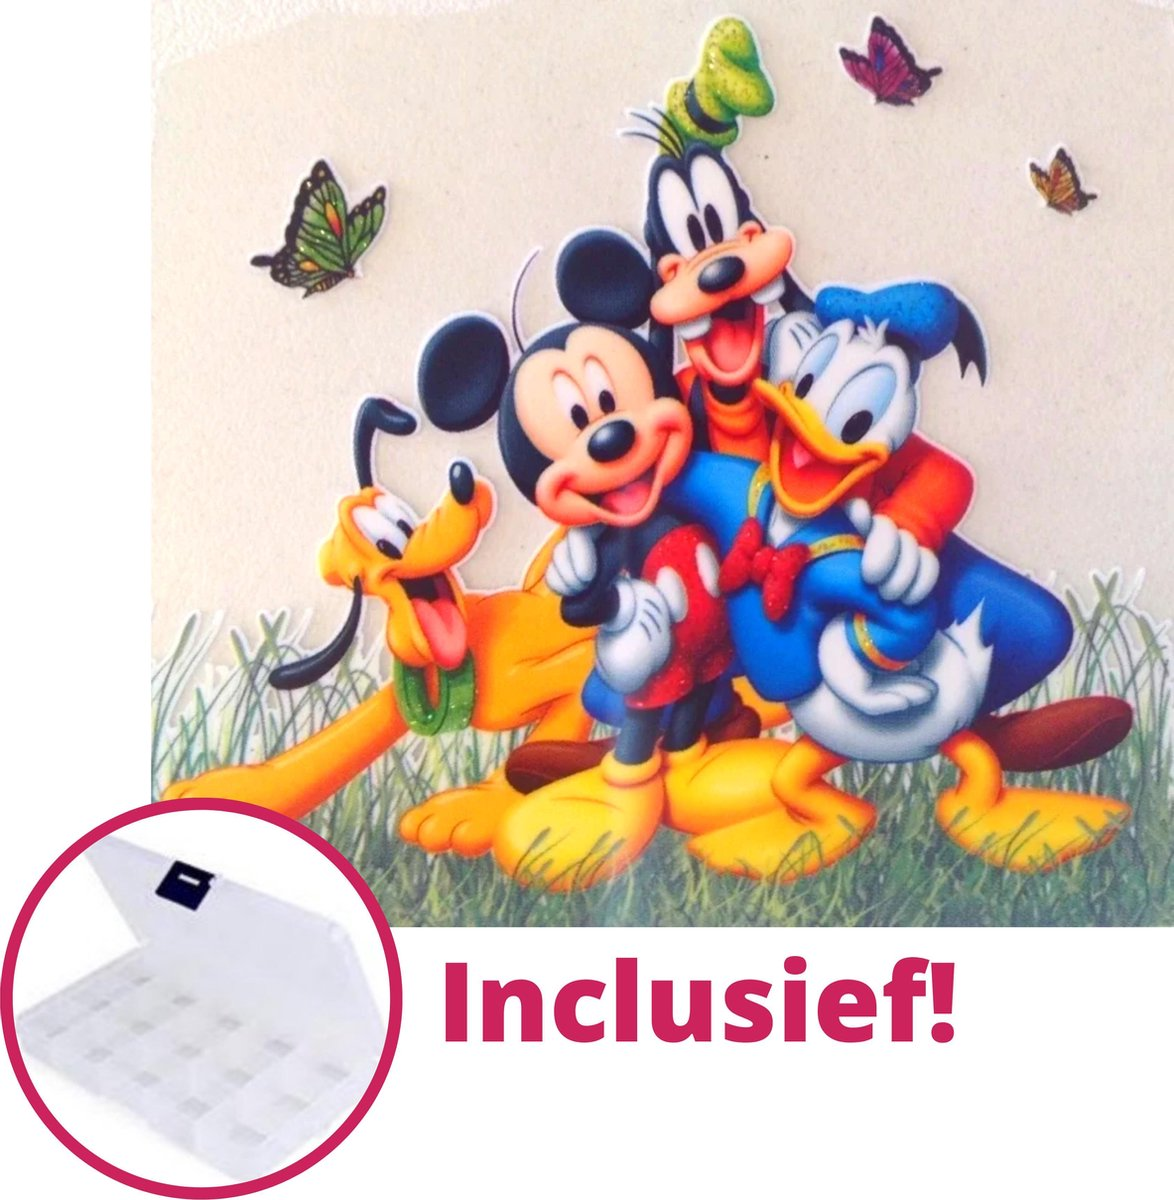 PremiumBenefits - Diamond Painting Mickey Mouse - Inclusief Opbergdoos en Accessoires - Disney Diamond Painting Pakket Volledig